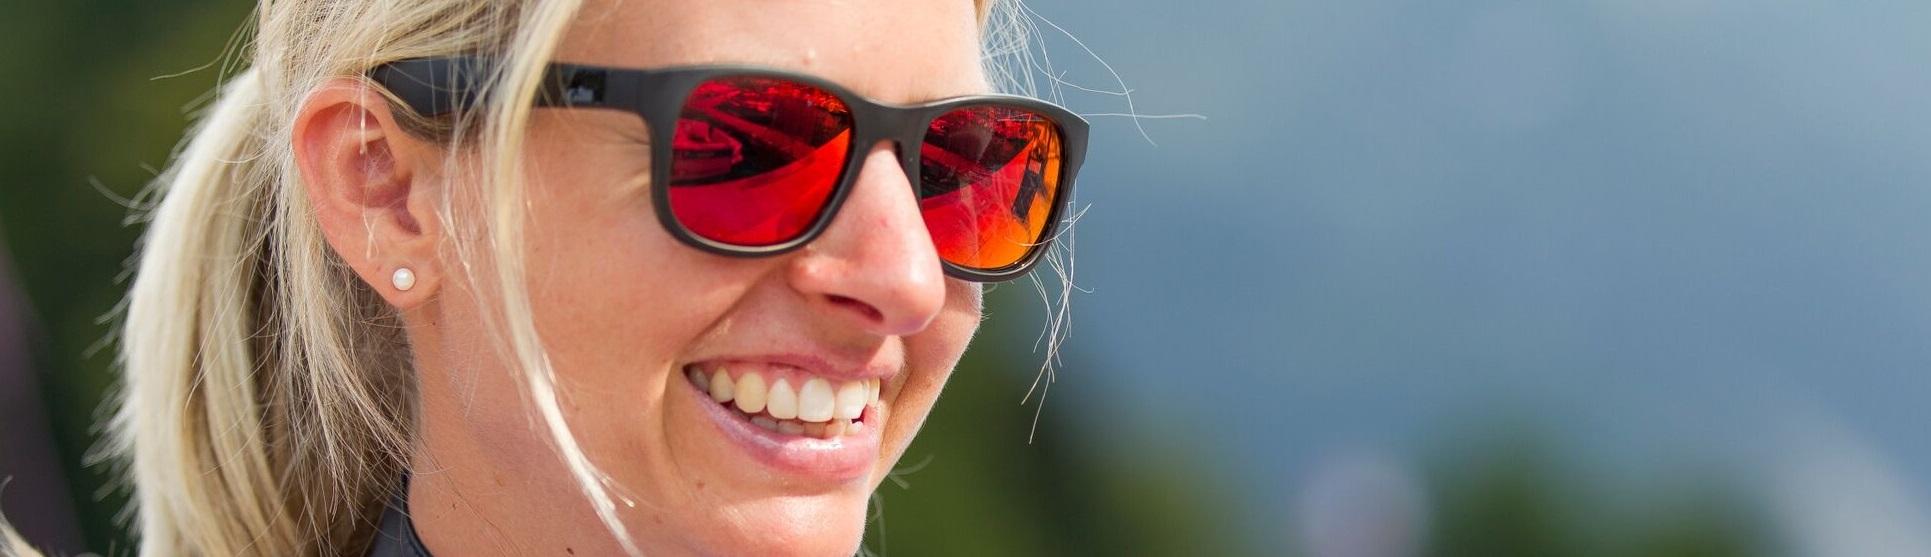 banner-sunglasses-apparel-.jpeg